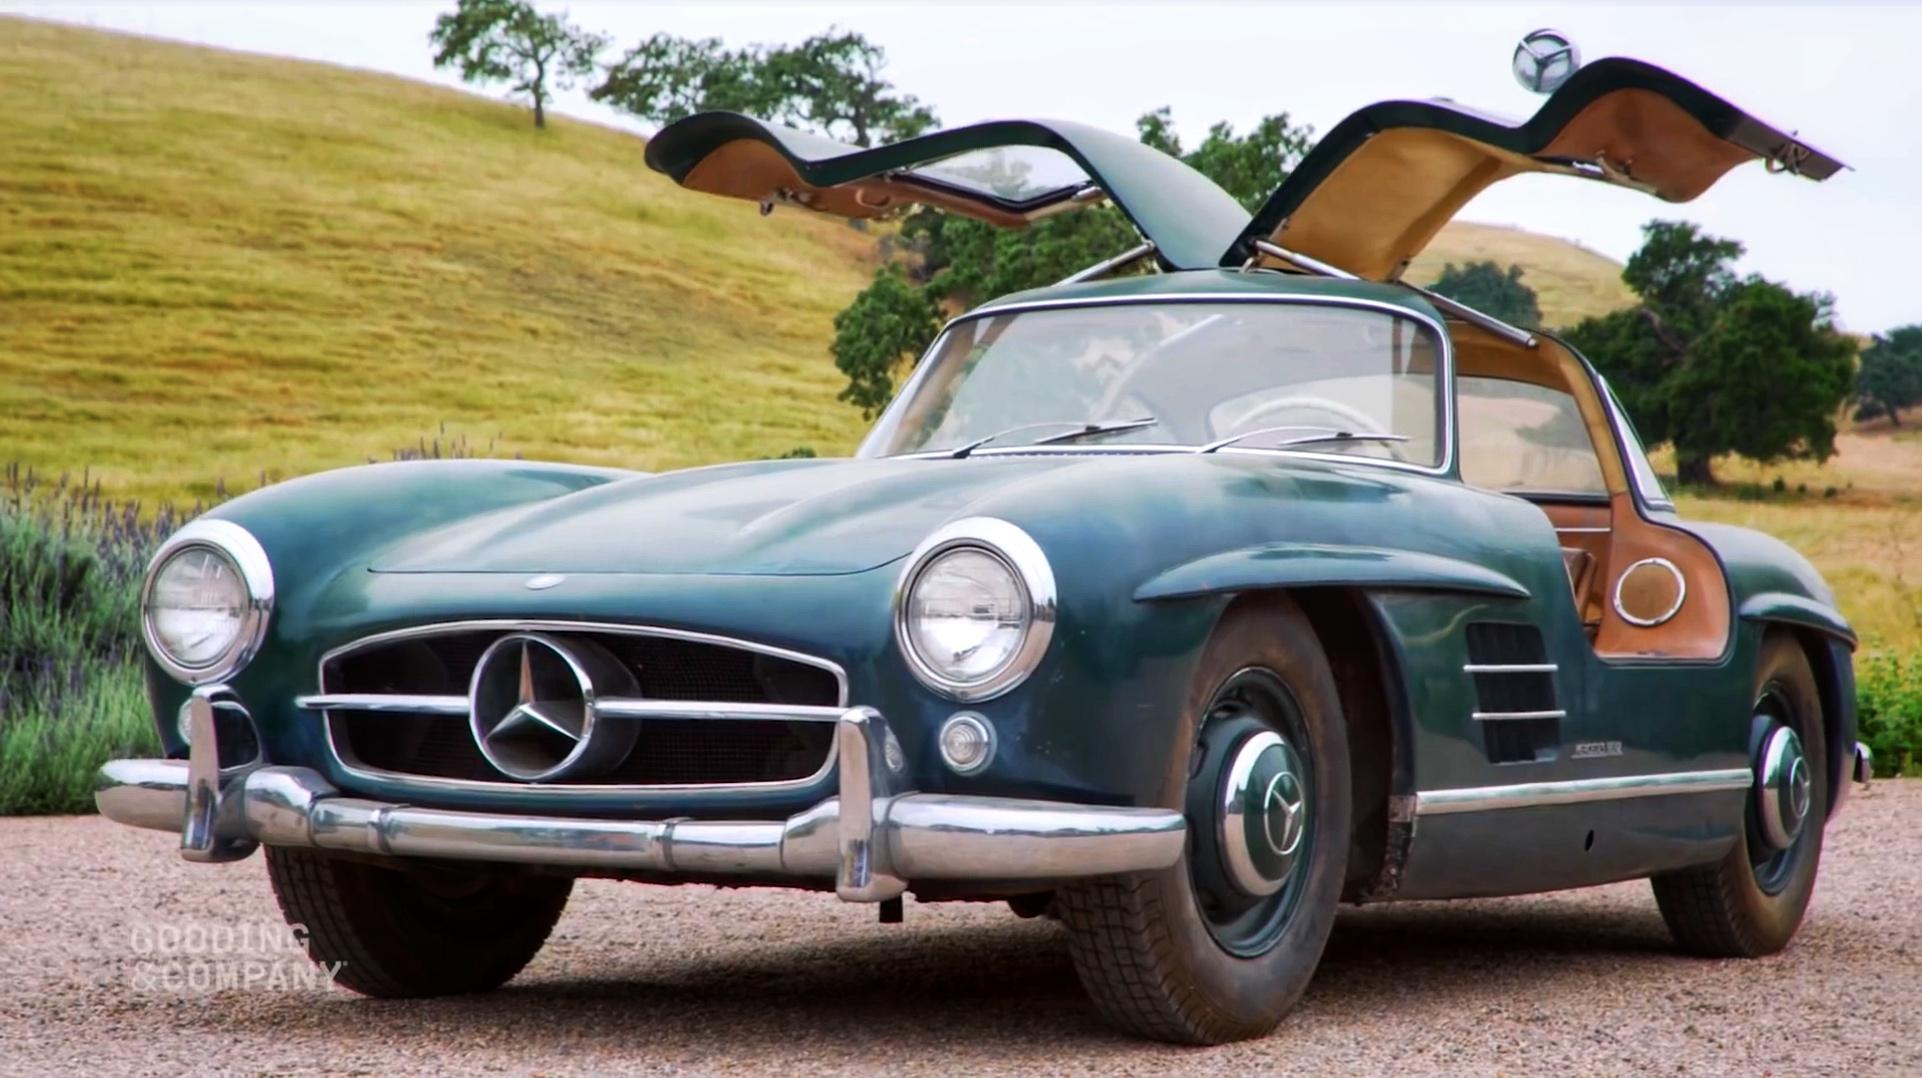 schuurvondst Mercedes 300 SL Gullwing Roadster